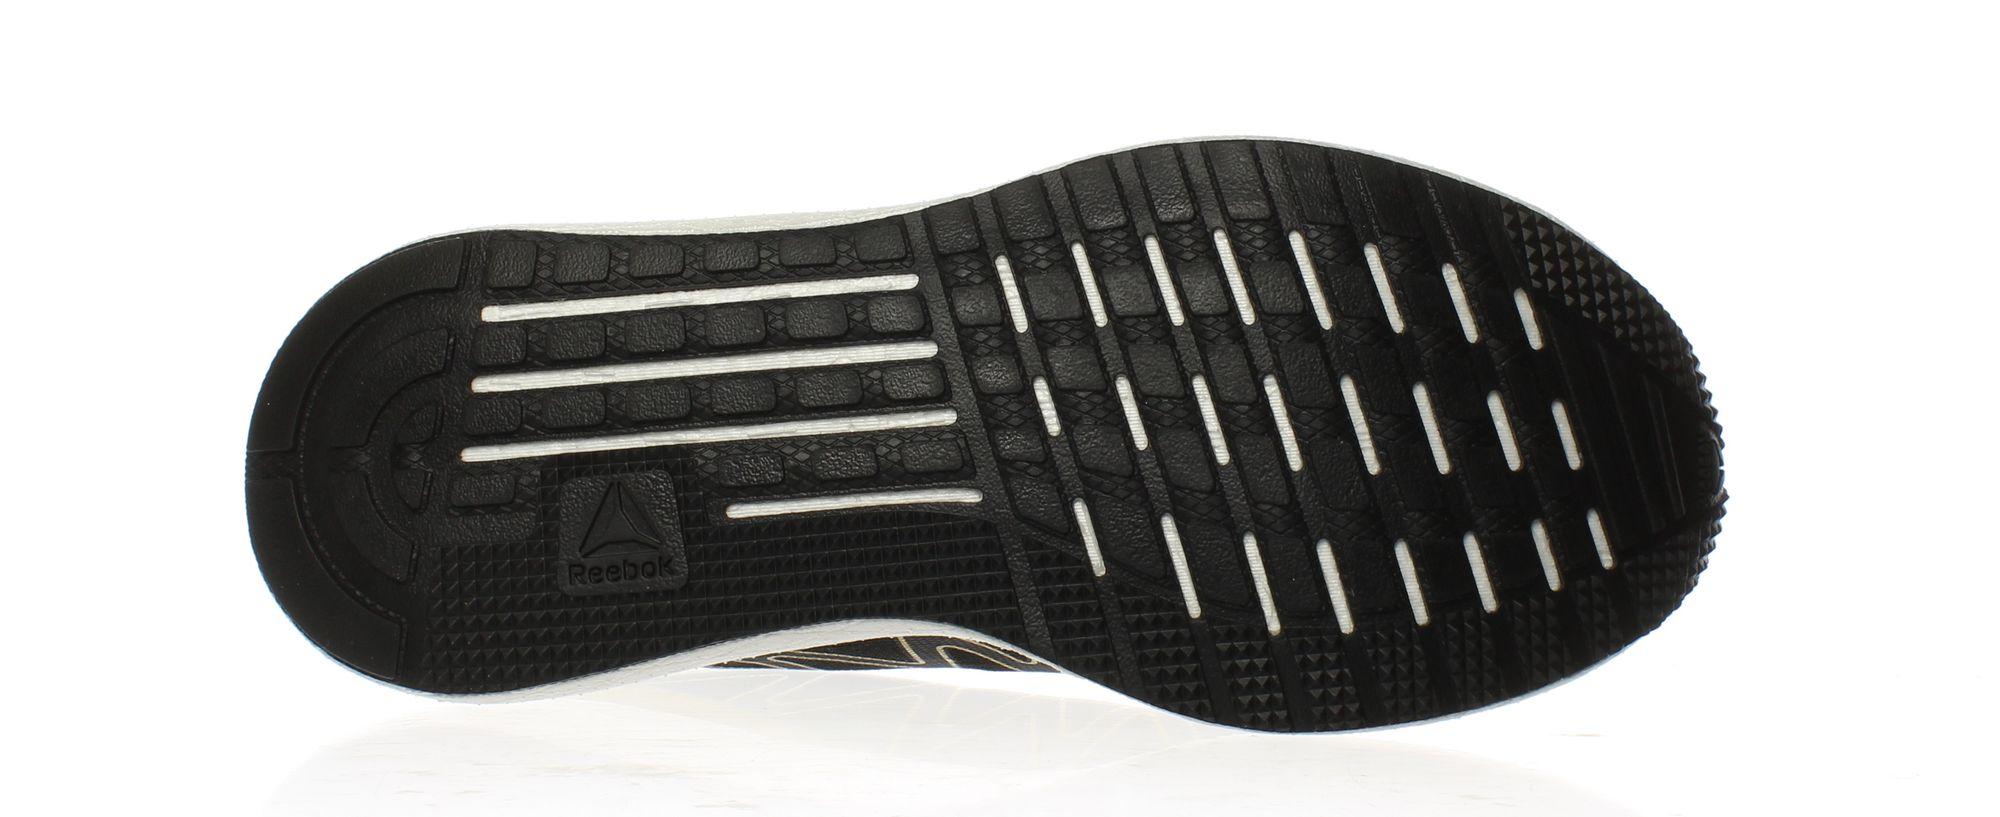 Reebok-Womens-Forever-Floatride-Energy-Running-Shoes thumbnail 9